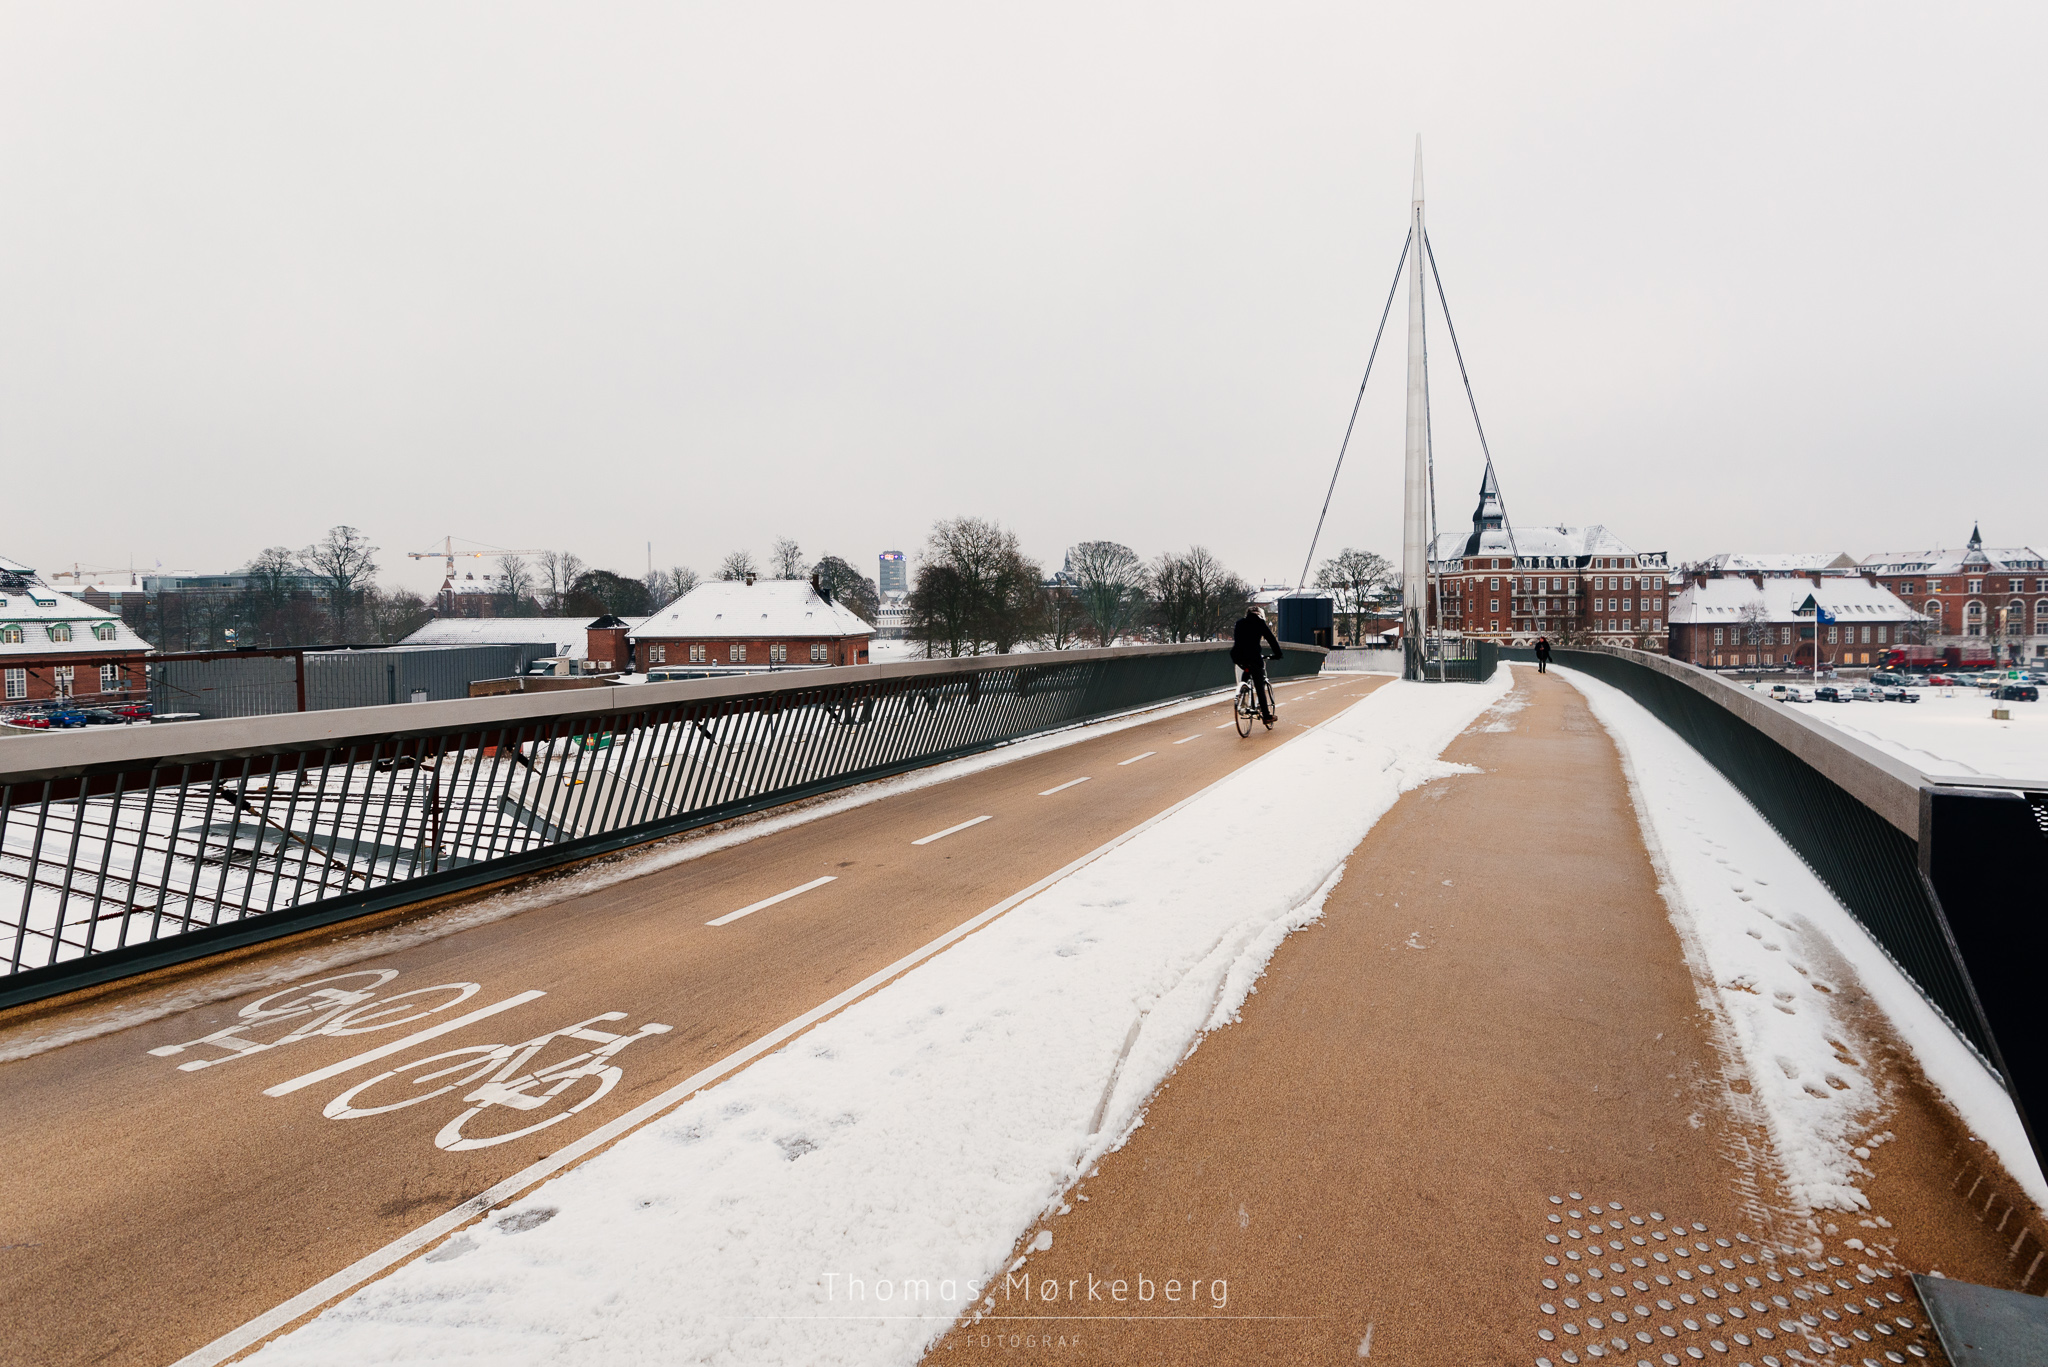 Cyclist in the snow on Byens bro (bridge) in Odense, Denmark